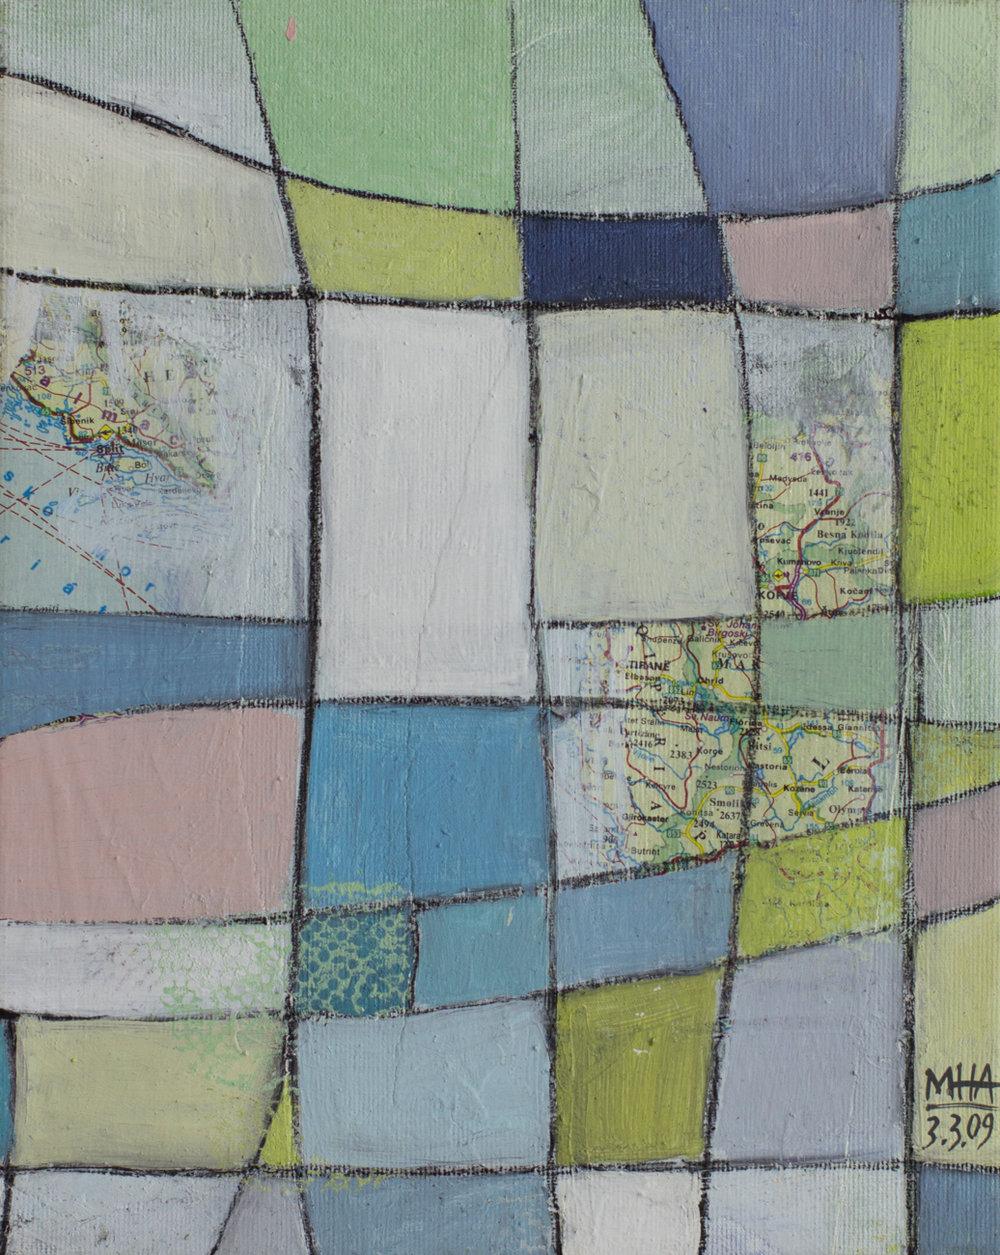 Fantasie in Linien 23 , 2009,Acryl auf Leinwand, 24x30 cm